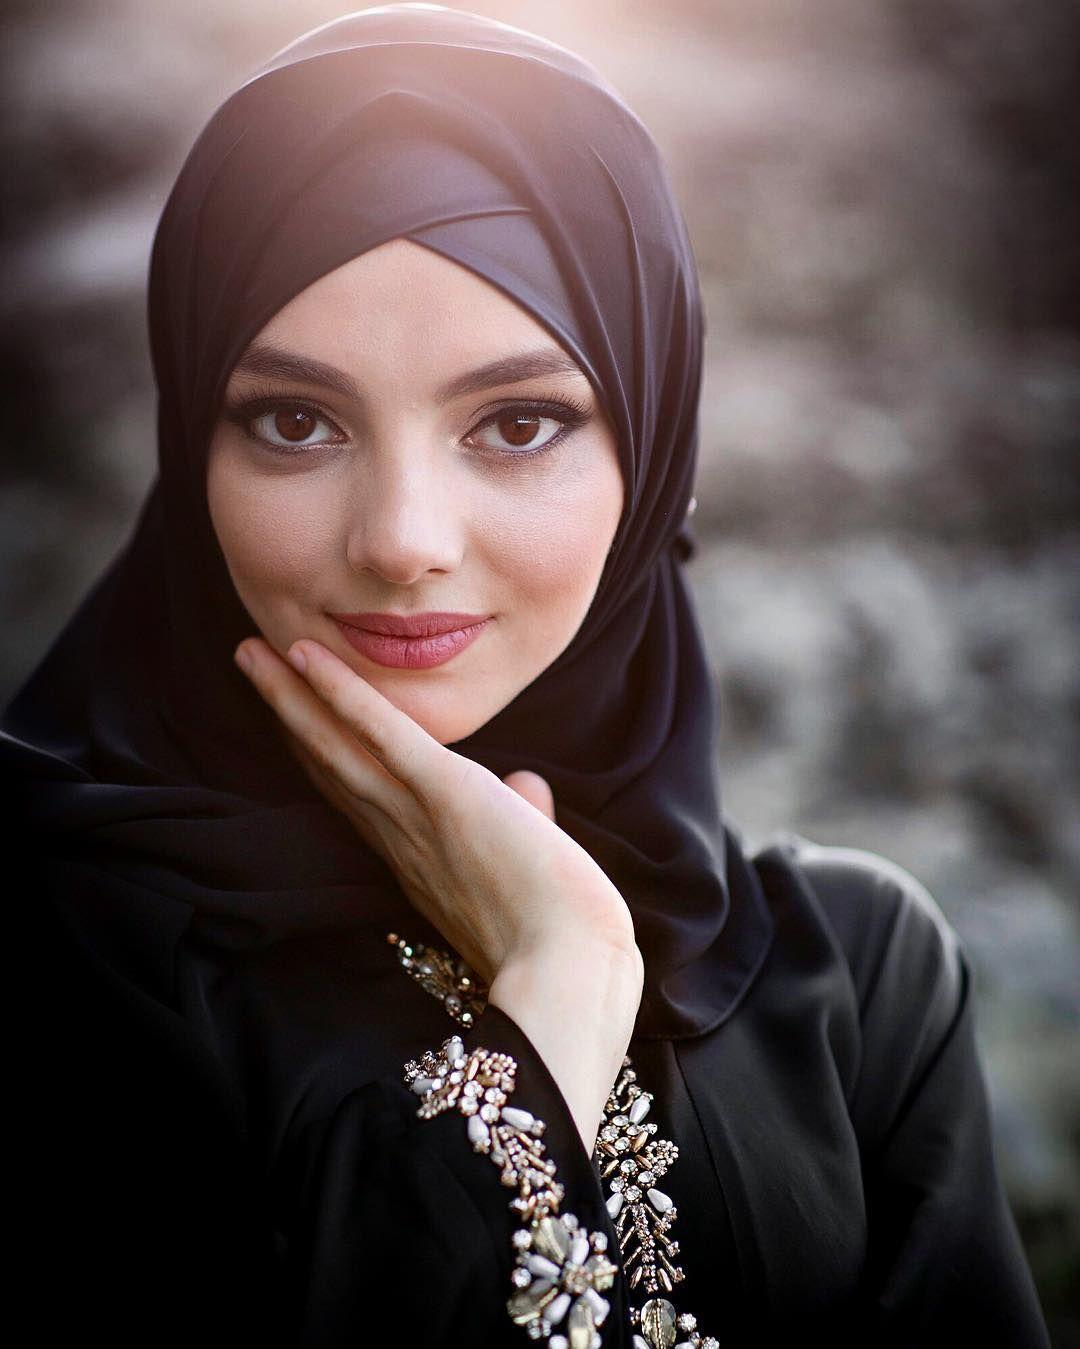 recherche femme musulmane montreal